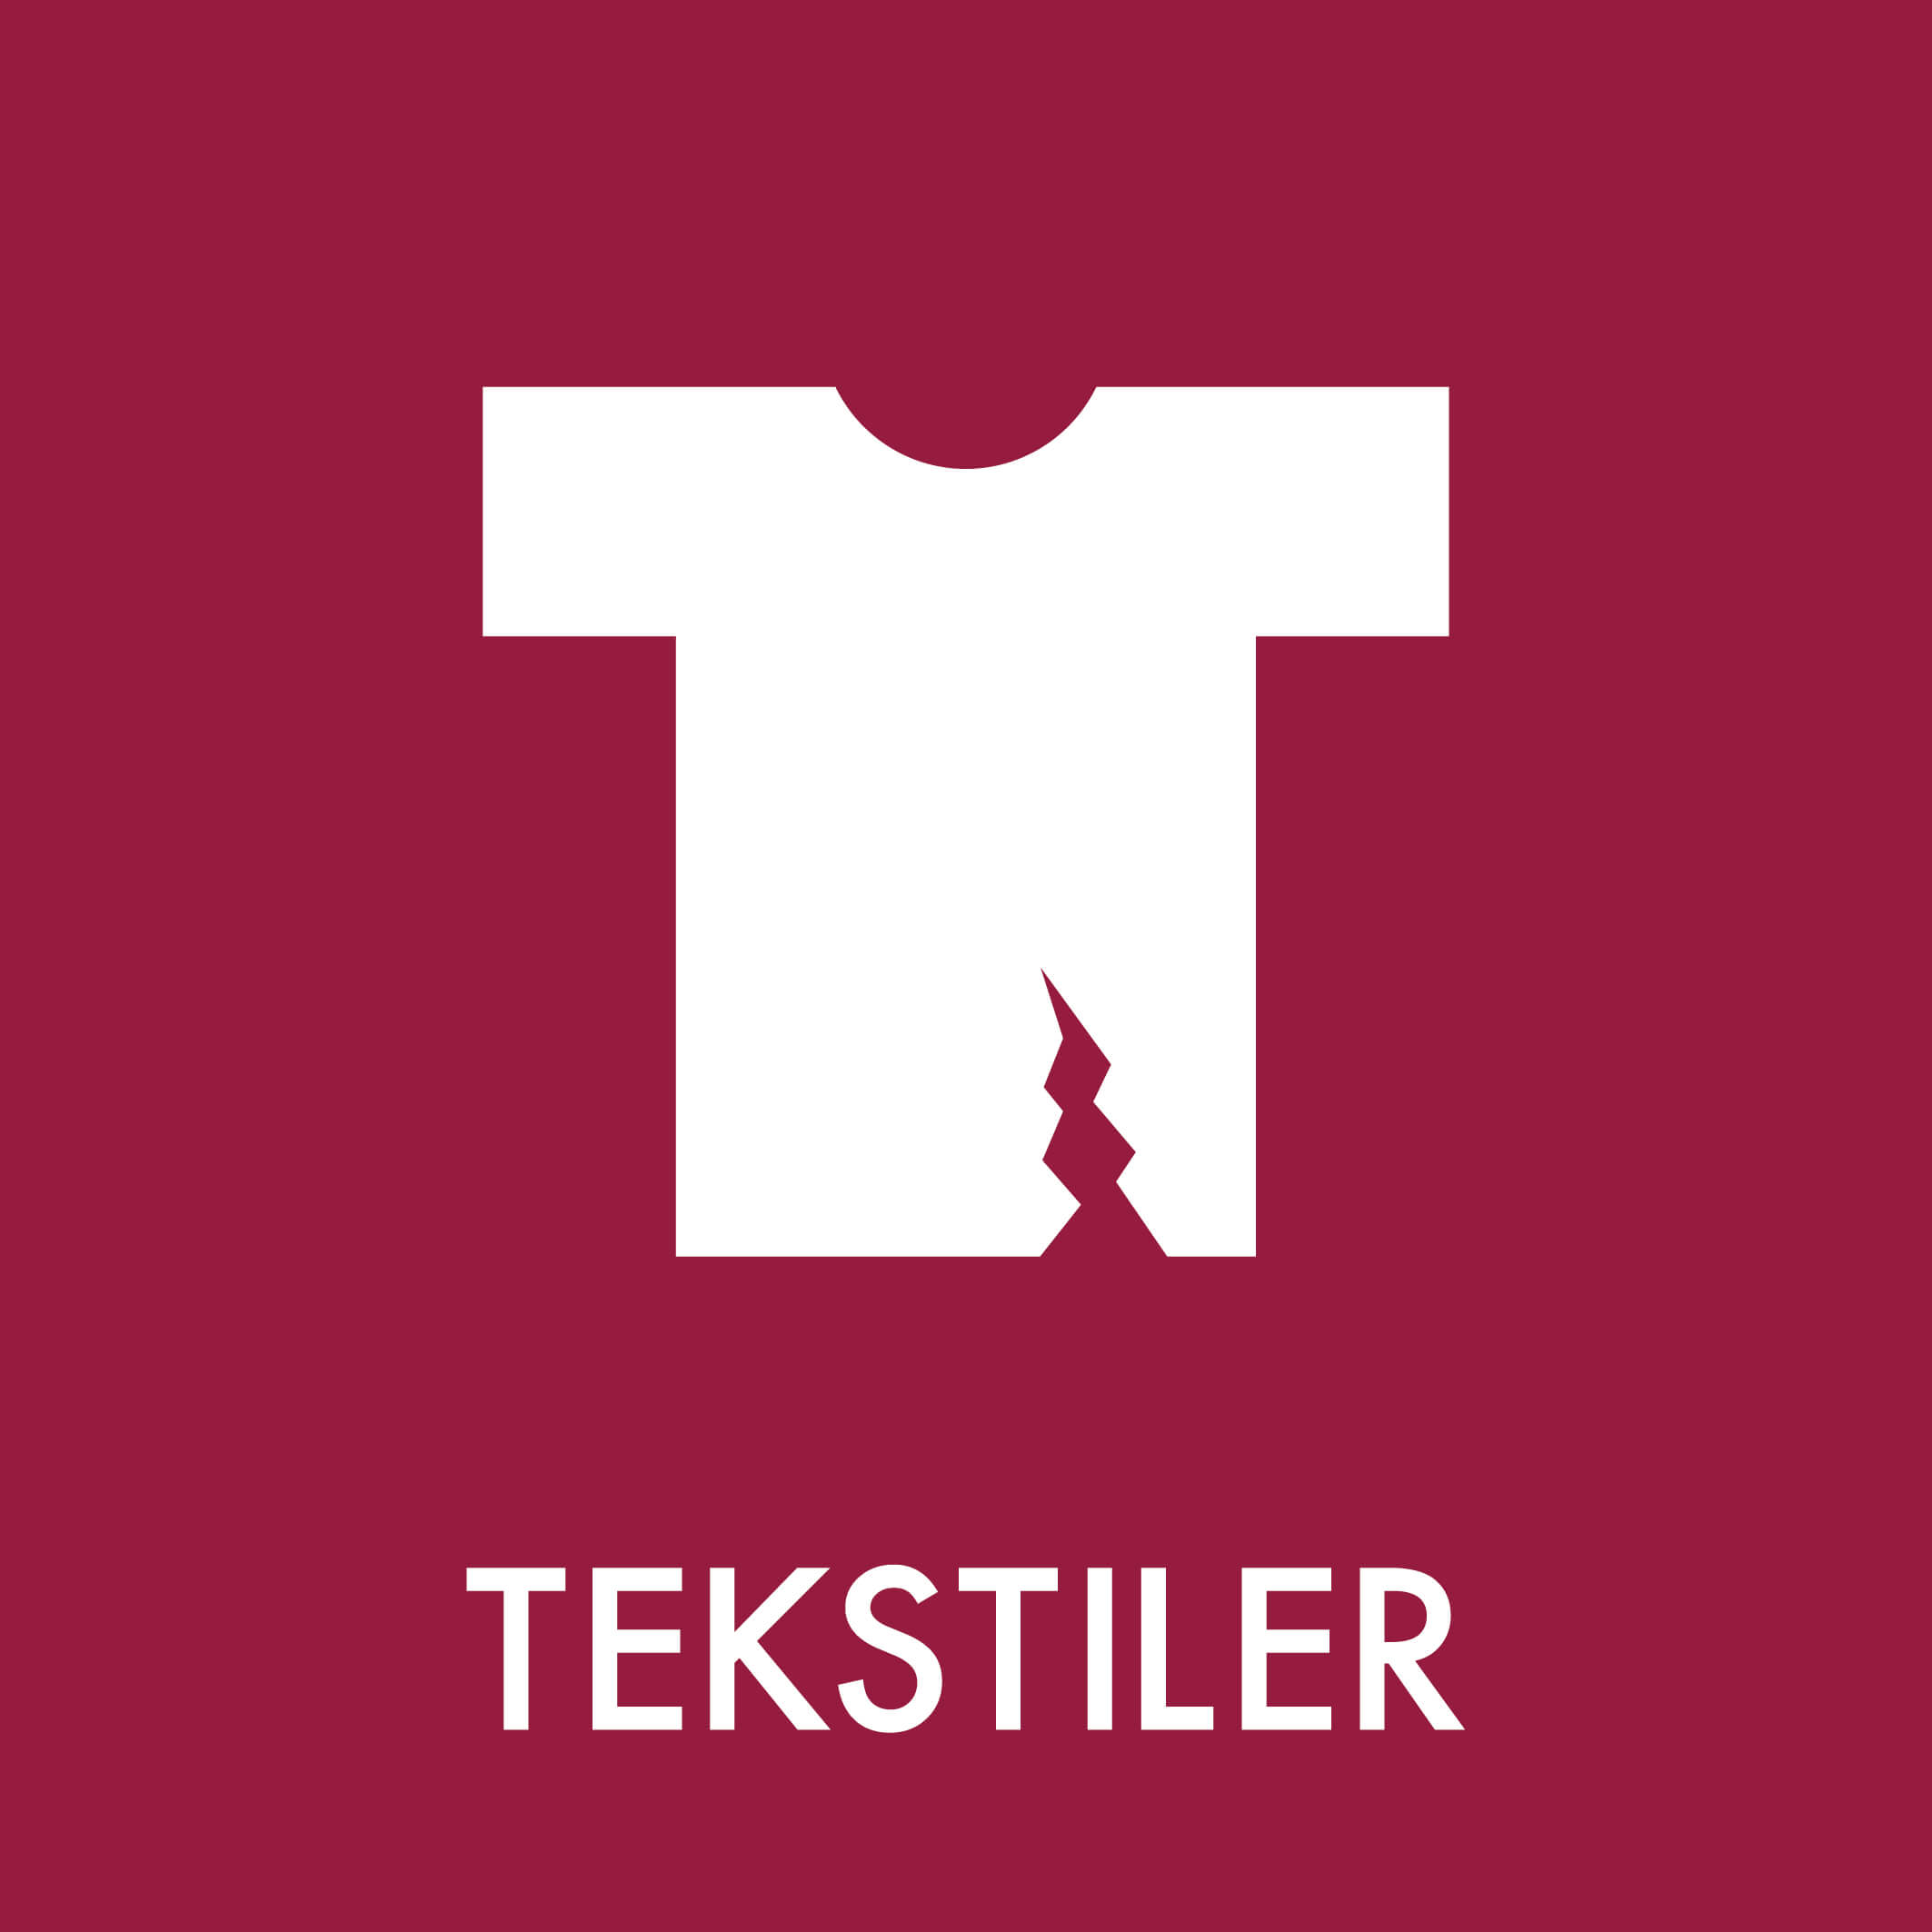 Dansk Affaldssortering - Tekstiler